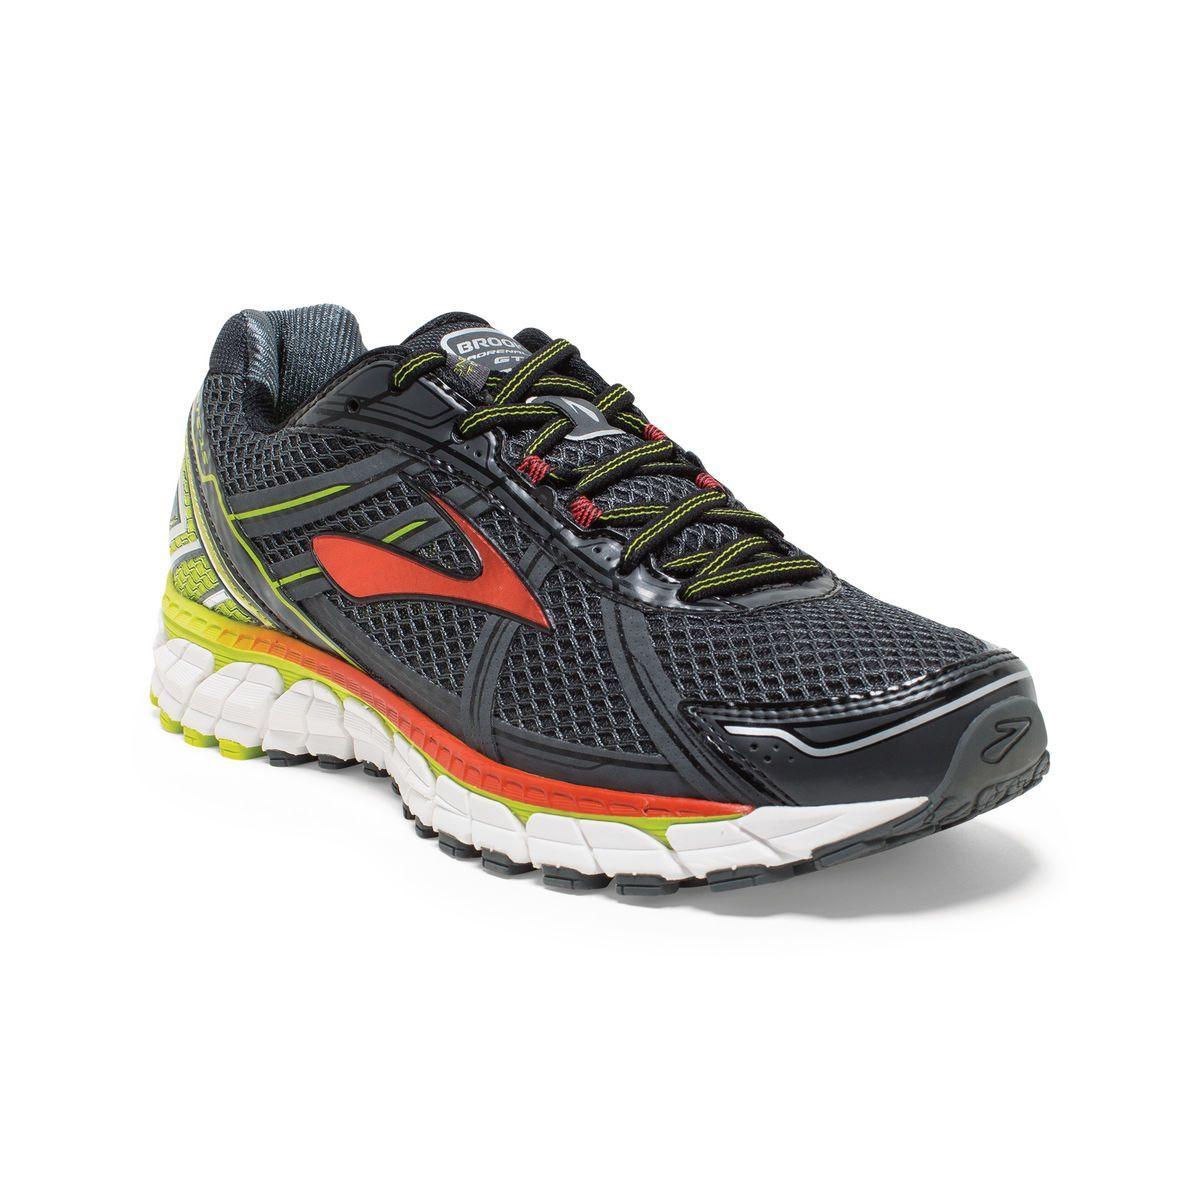 Brooks Adrenaline GTS 15 Road Running Shoe - Men's - D Width Size Color  Anthracite/LimePunch/Orange